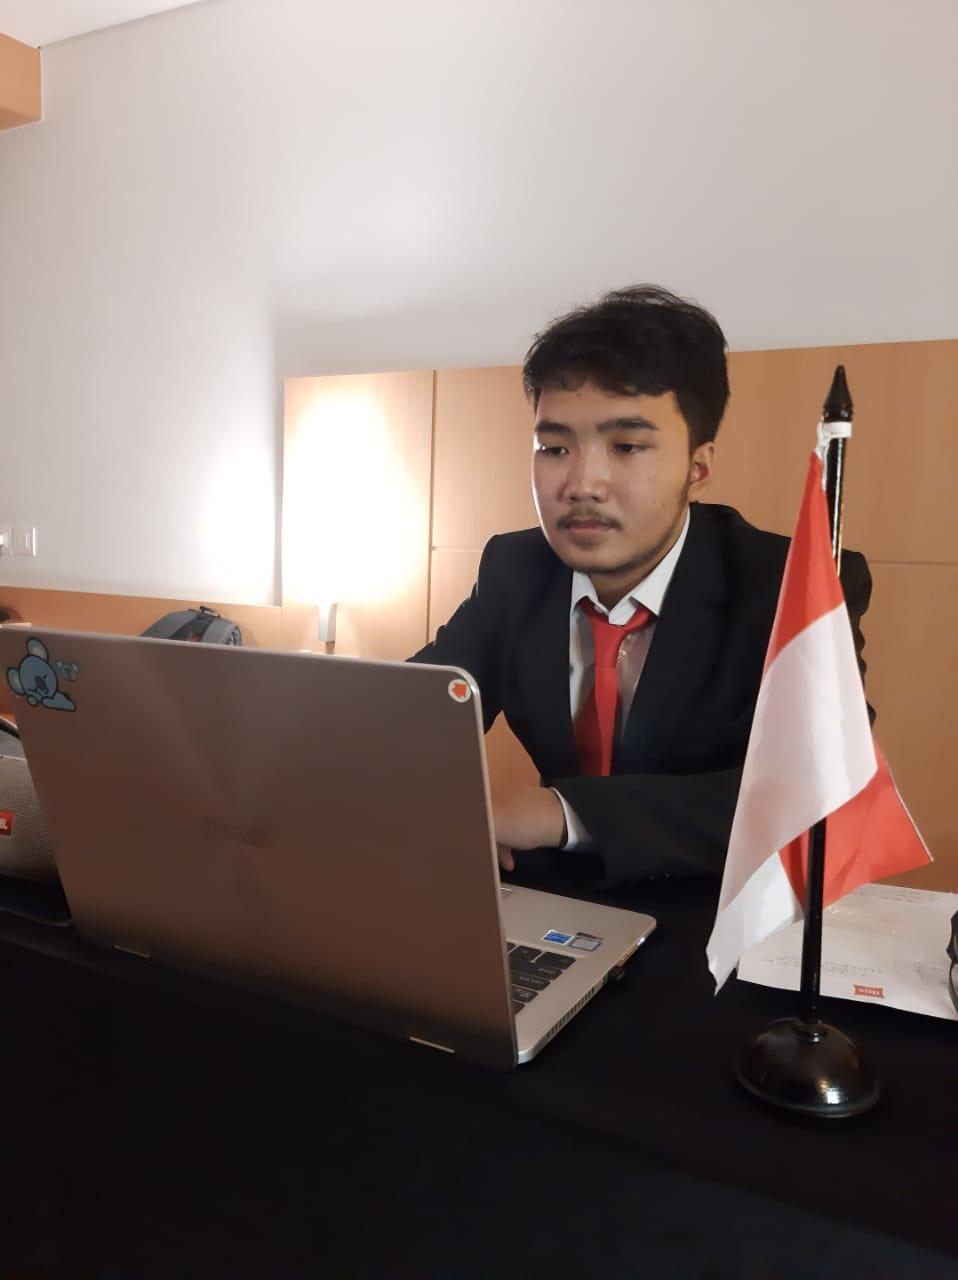 Indonesia Juara II Dunia Business Case pada Ajang International Economics Olympiad 2020/theeast.co.id